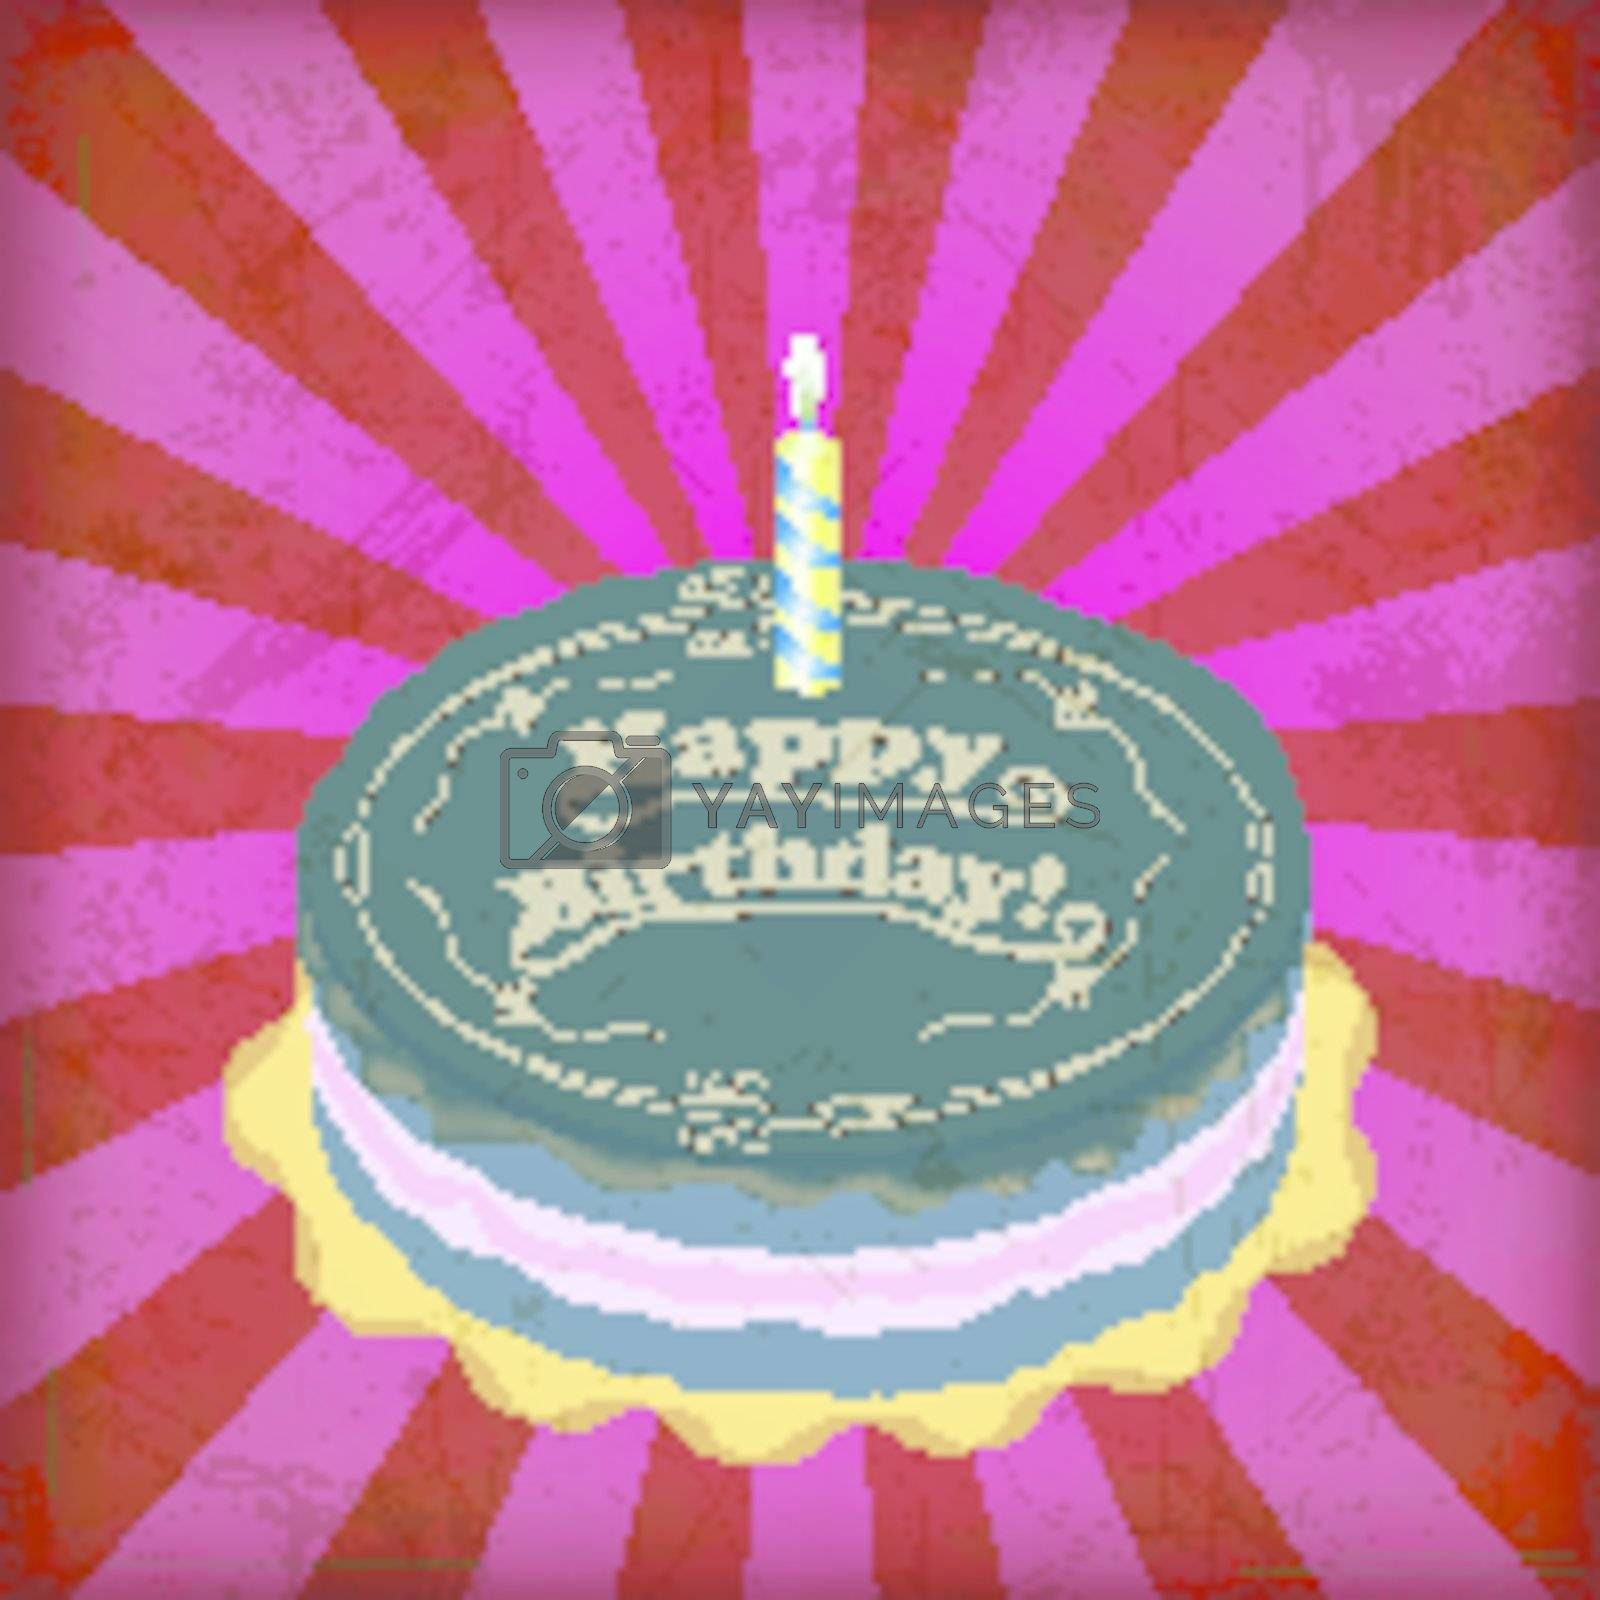 vintage birthday cake with Grunge Effect